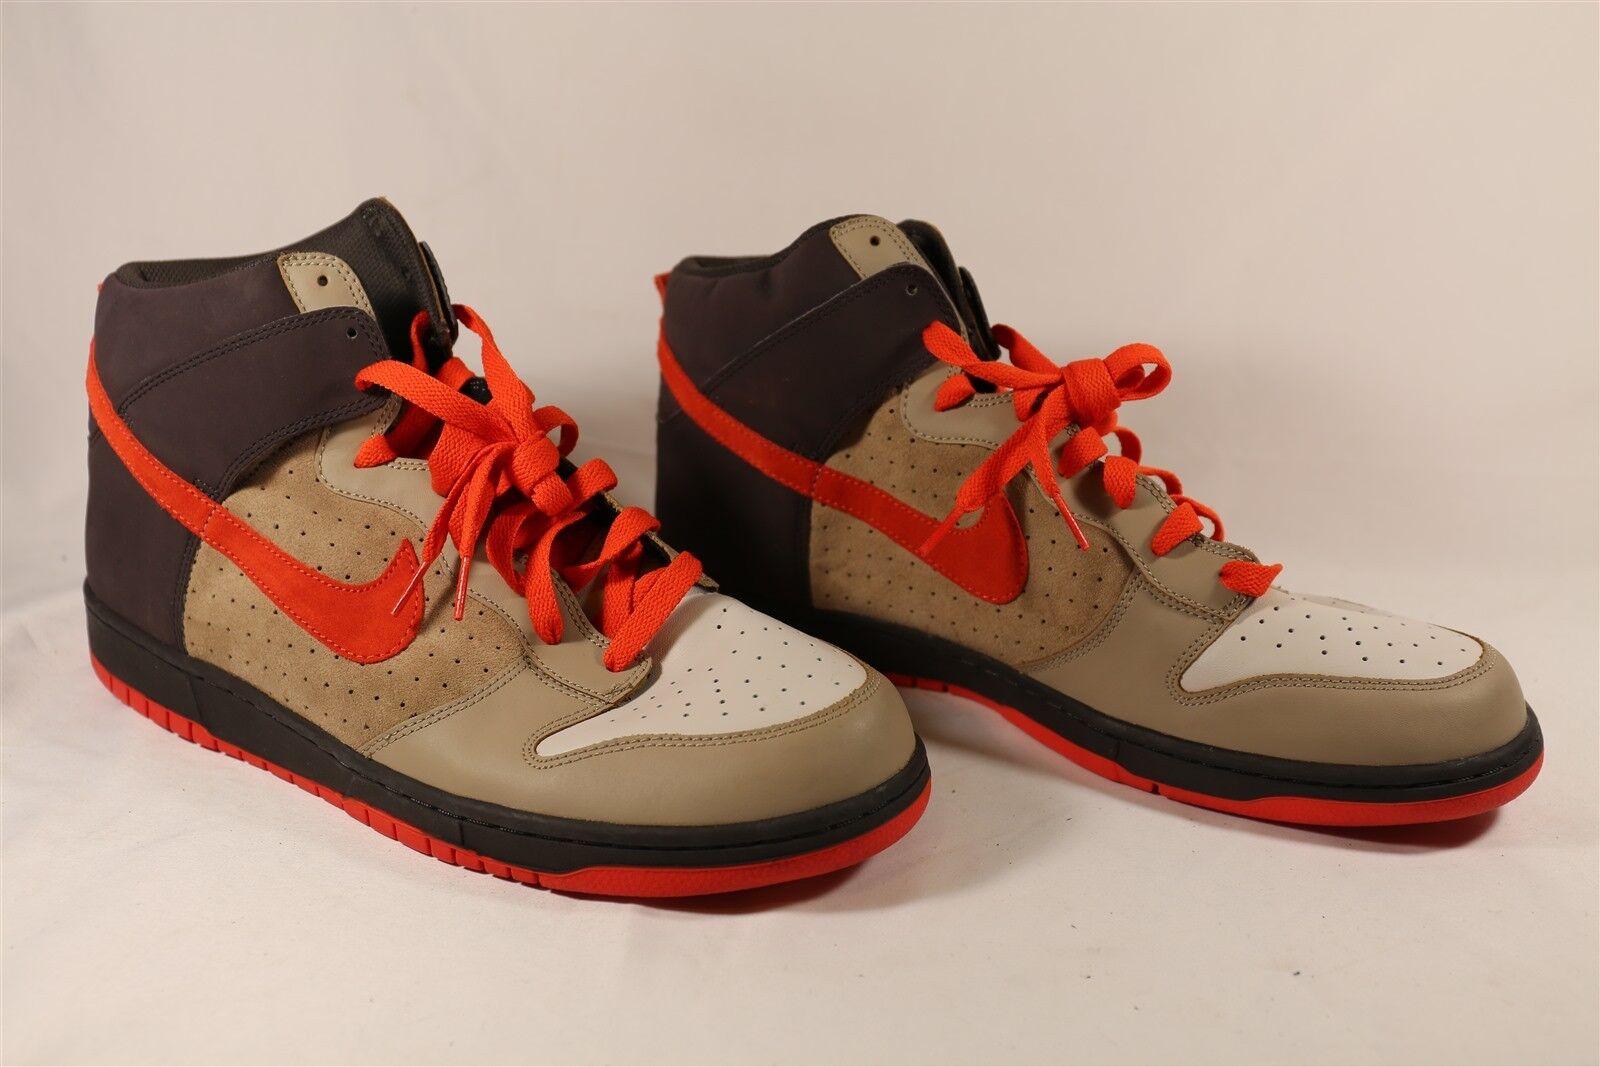 MENS NIKE DUNK HIGH BONE TEAM orange 317982 081 US shoes Size 15